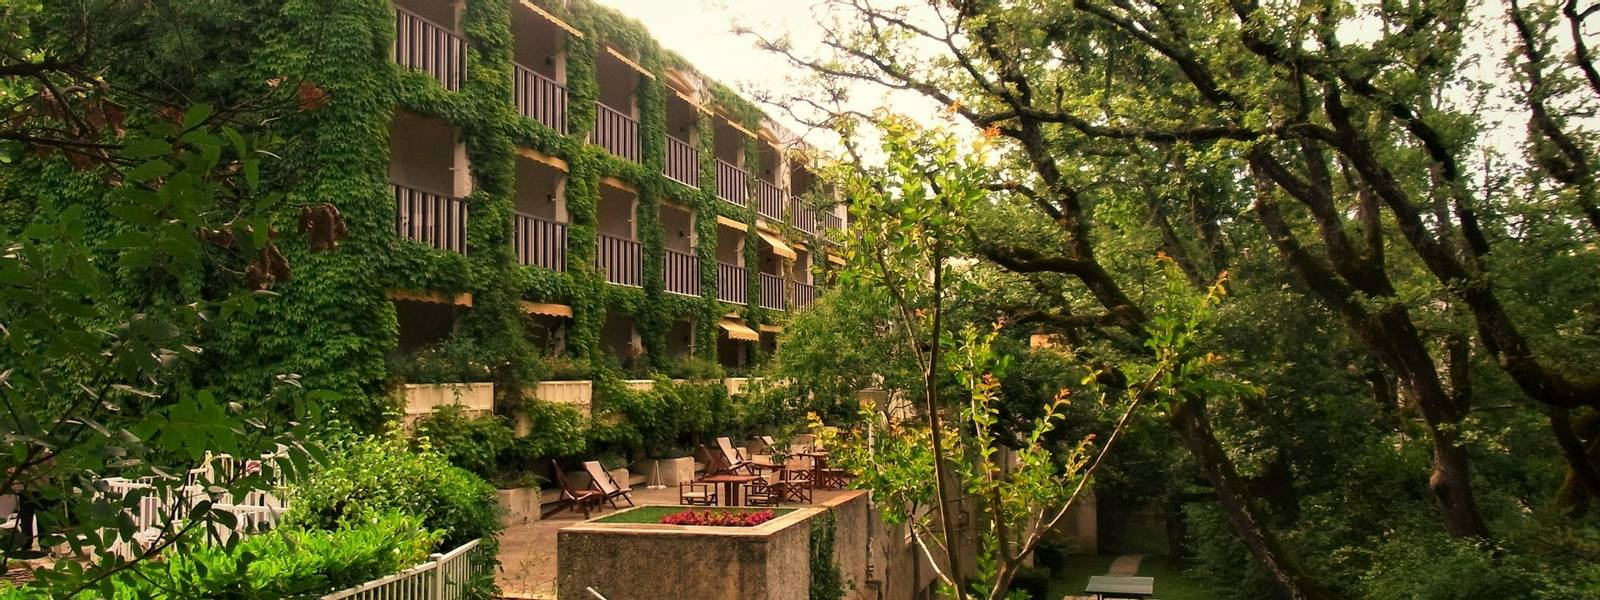 France - Villa Borghese - RIMG0352 Greoux hotel.jpg